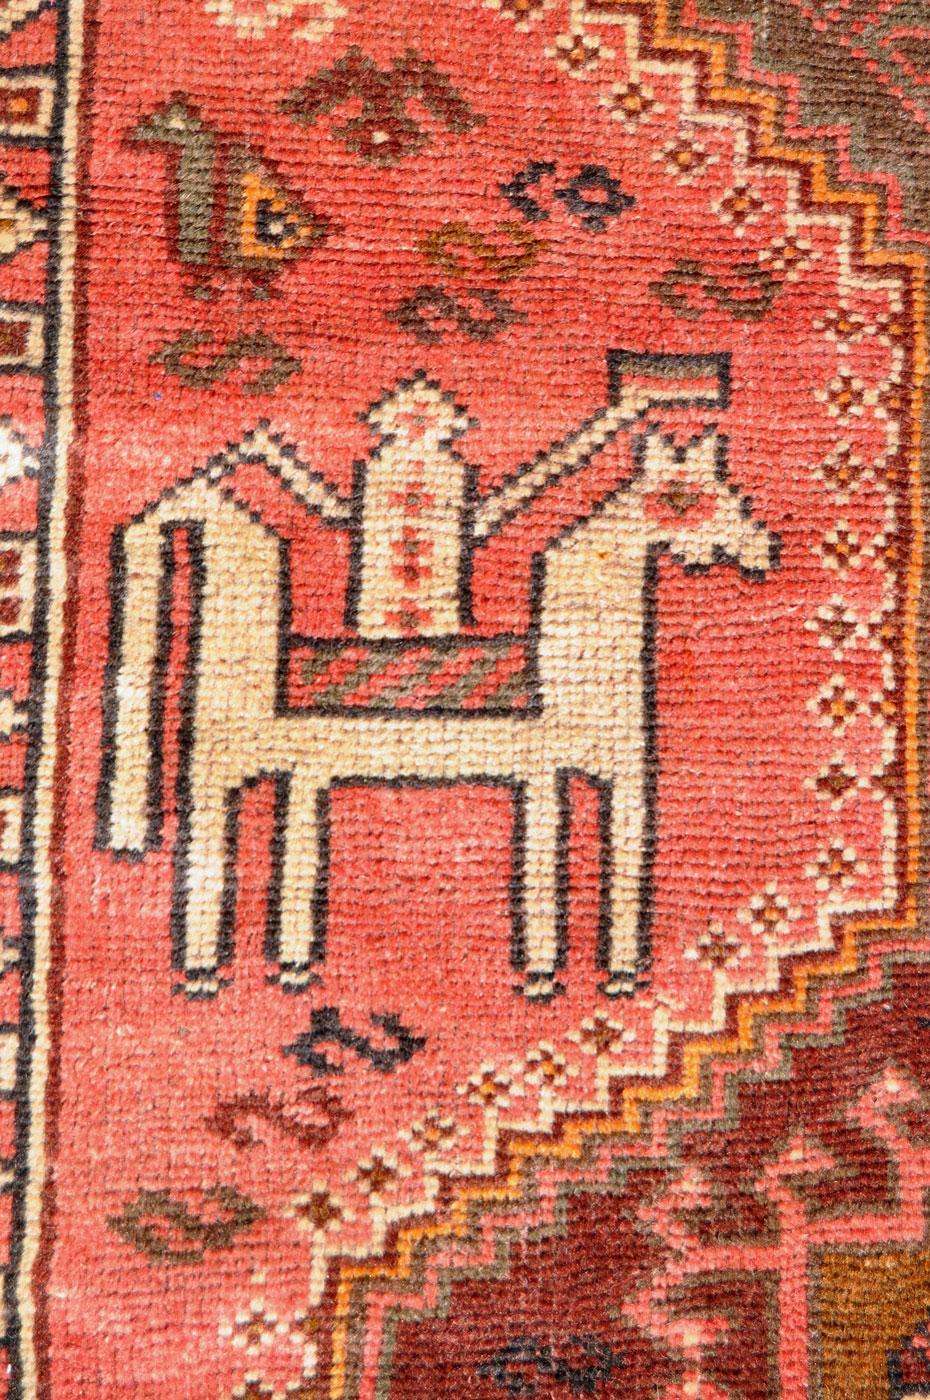 Tribal Persian Horseback Rider Rug